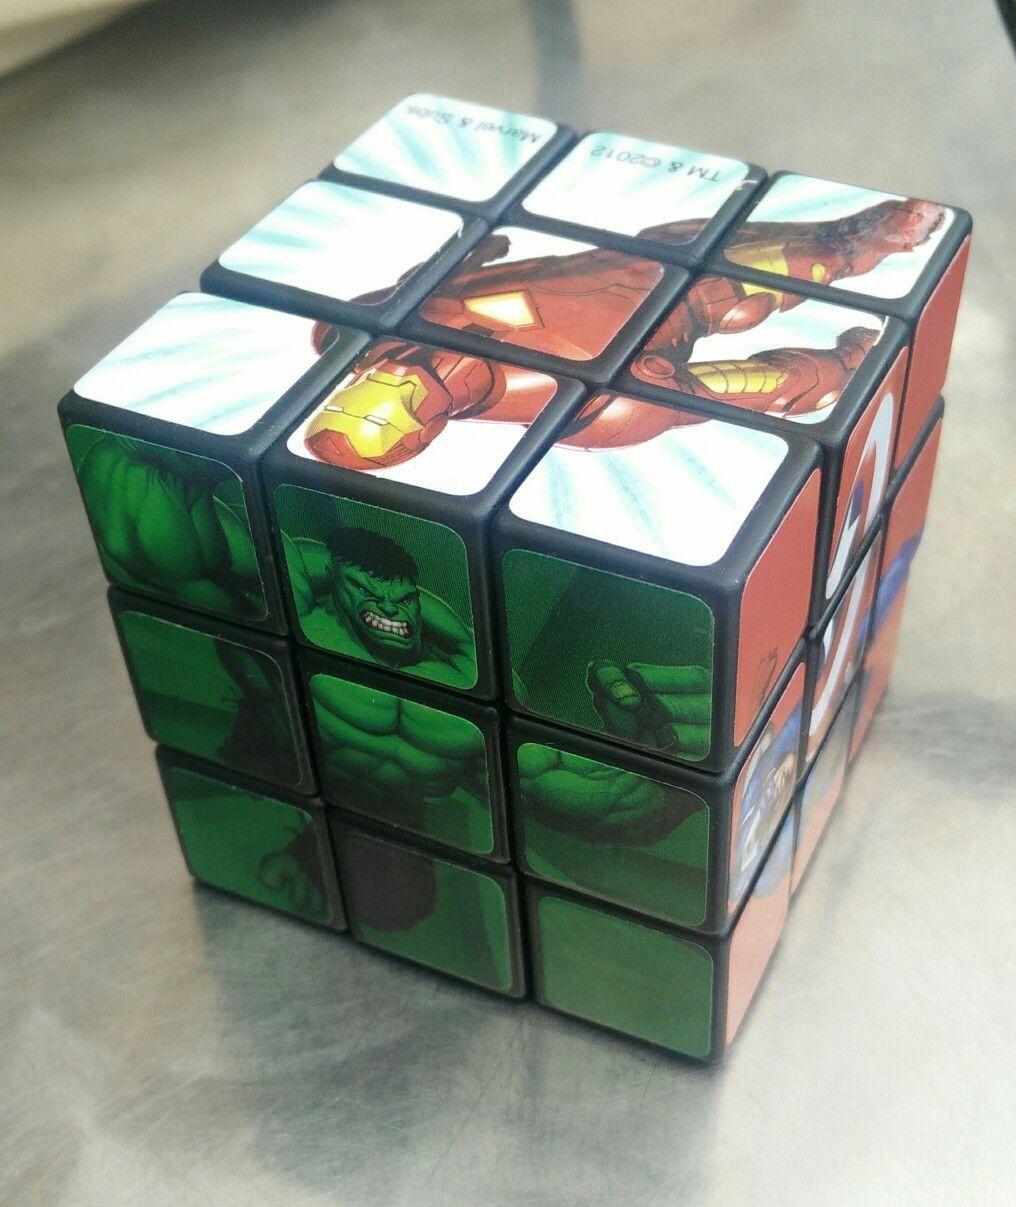 V-CUBE GEMS OF DESIGN Collection 2x2 /& 3x3 Brainteaser Cubes